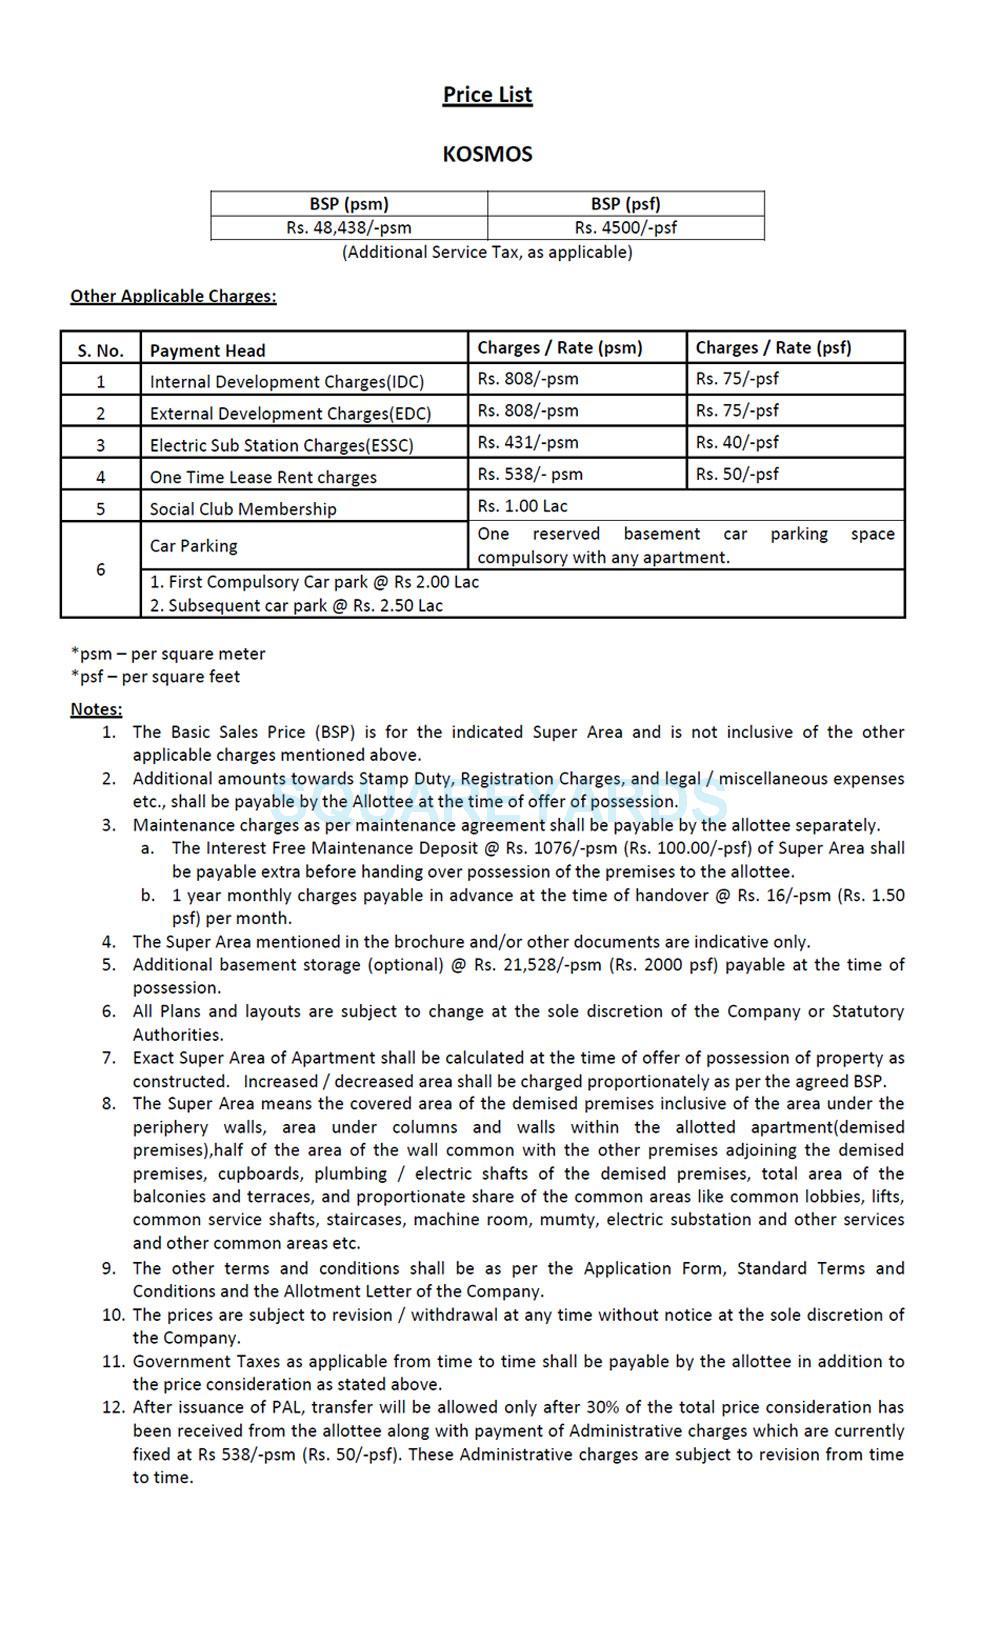 jaypee kosmos payment plan image2